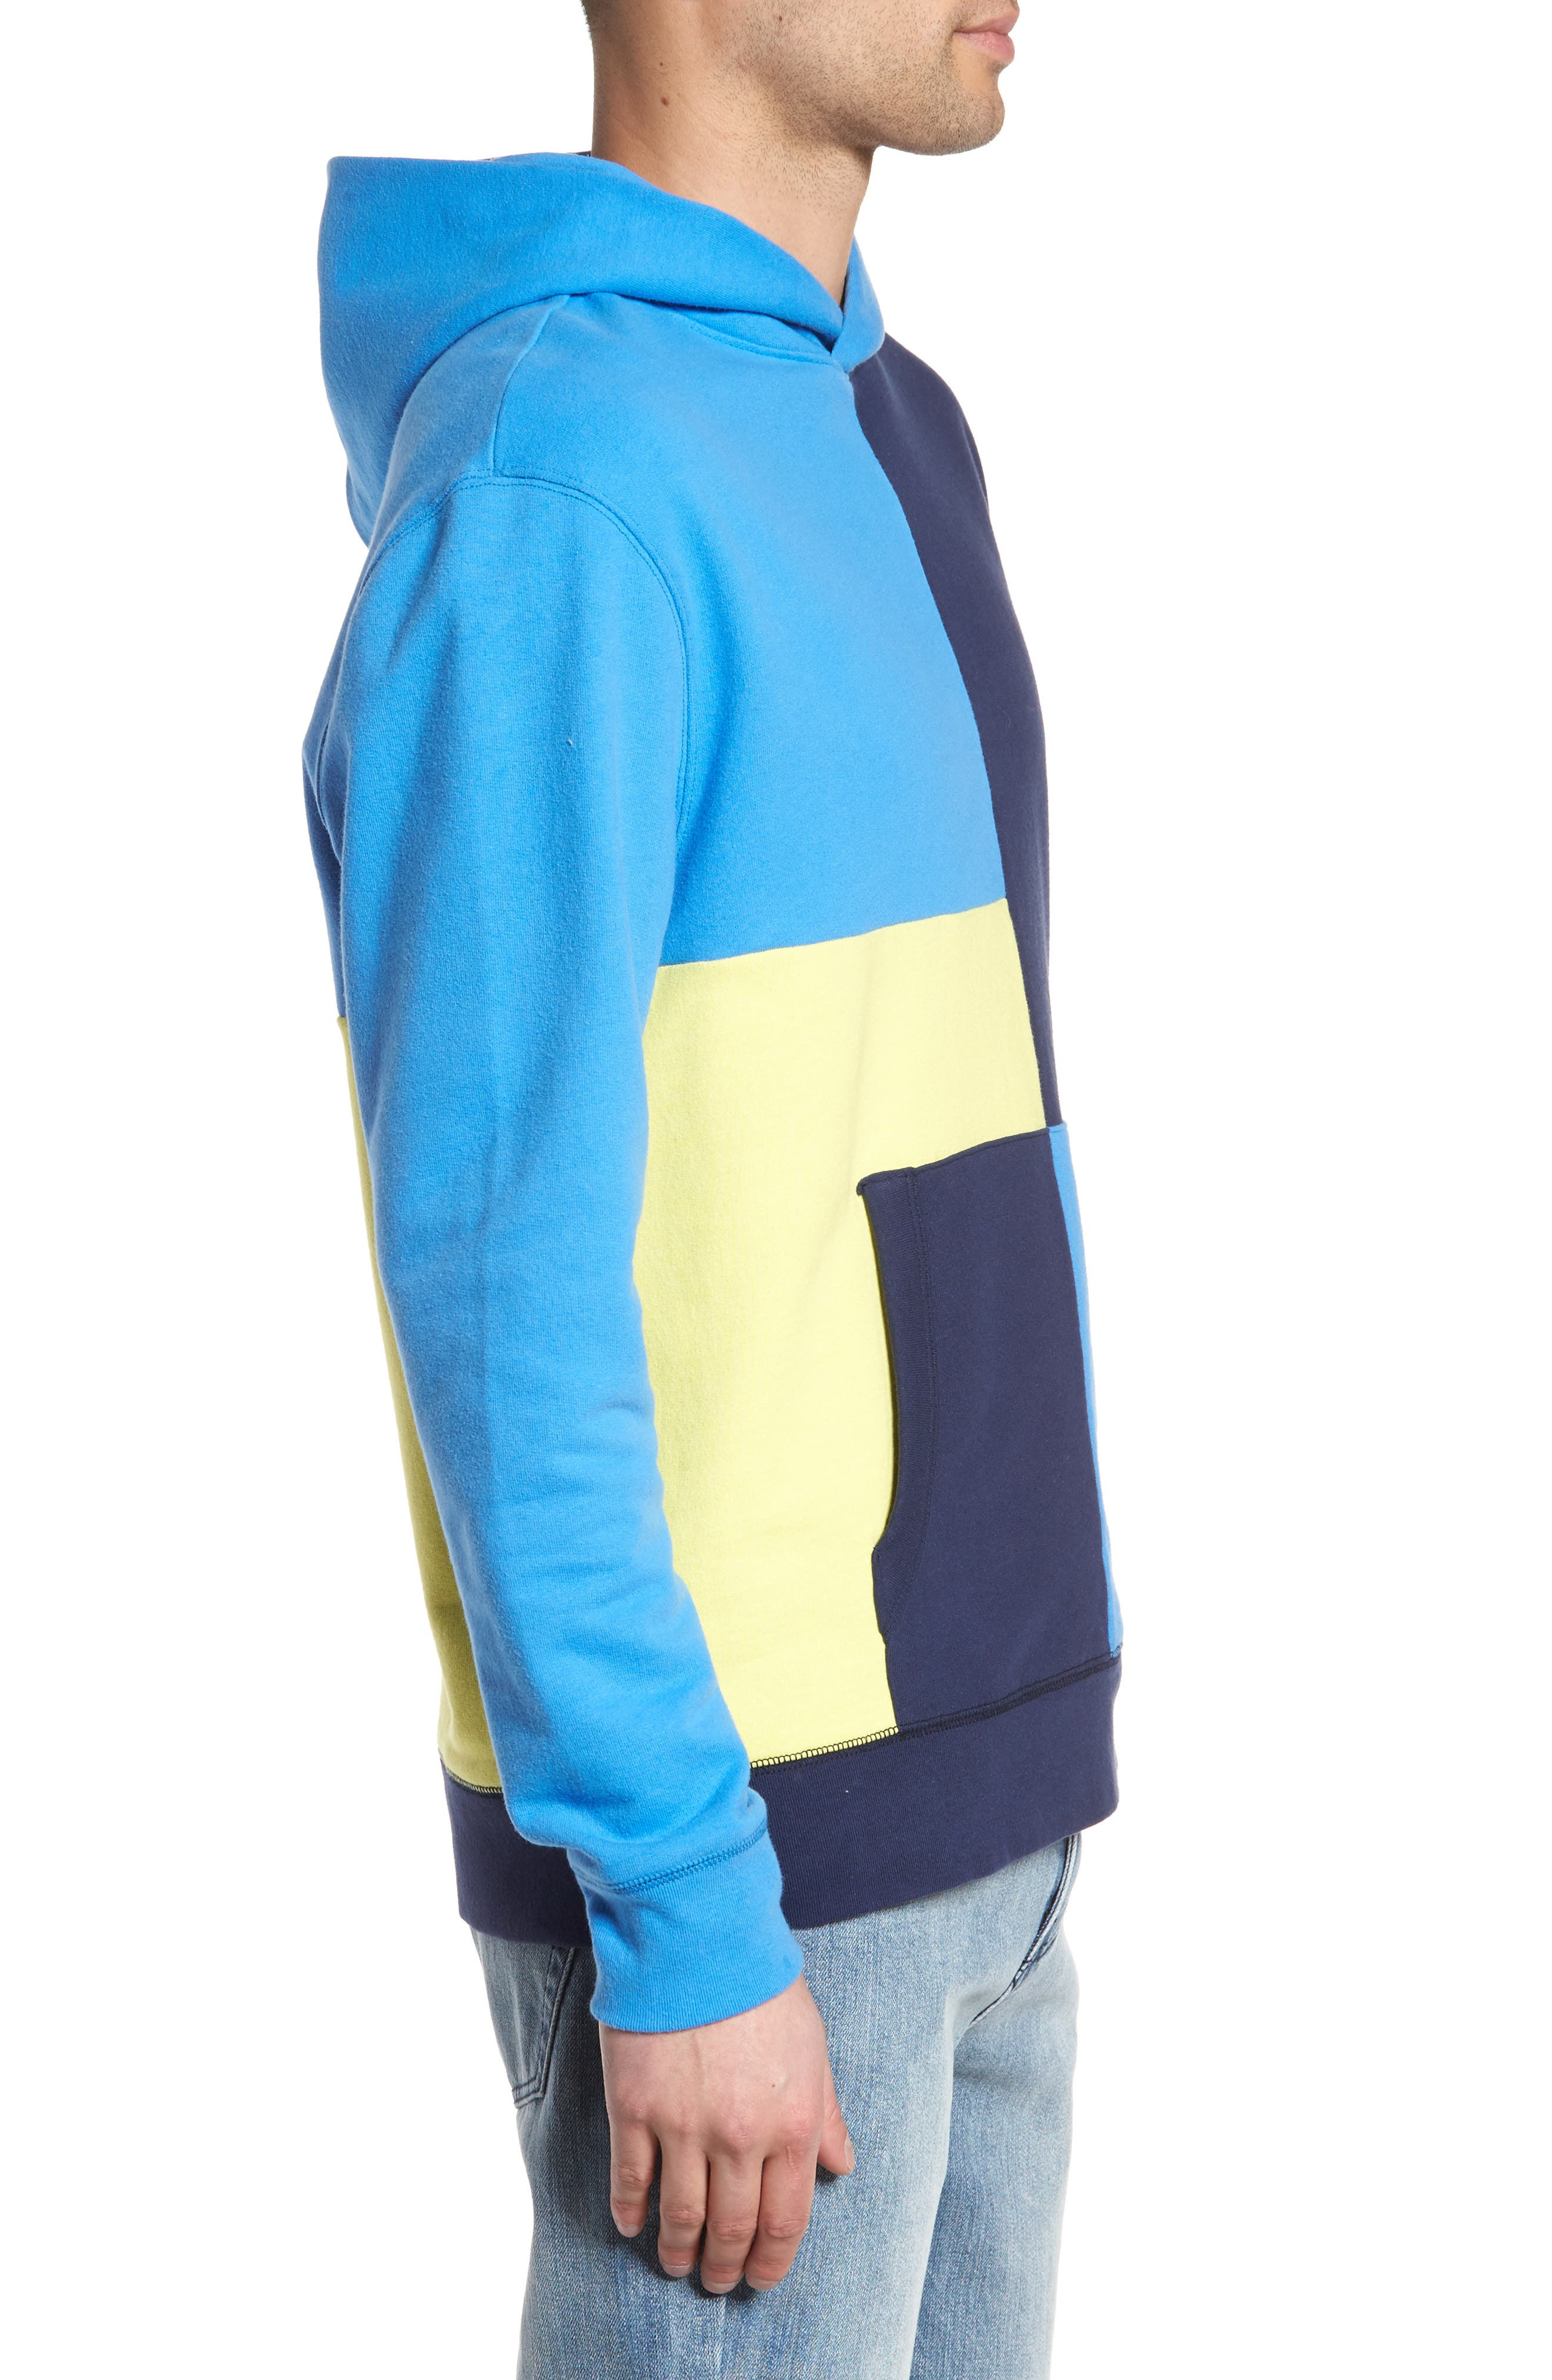 Colorblock Hoodie Sweatshirt,                             Alternate thumbnail 3, color,                             Navy Blue Yellow Block